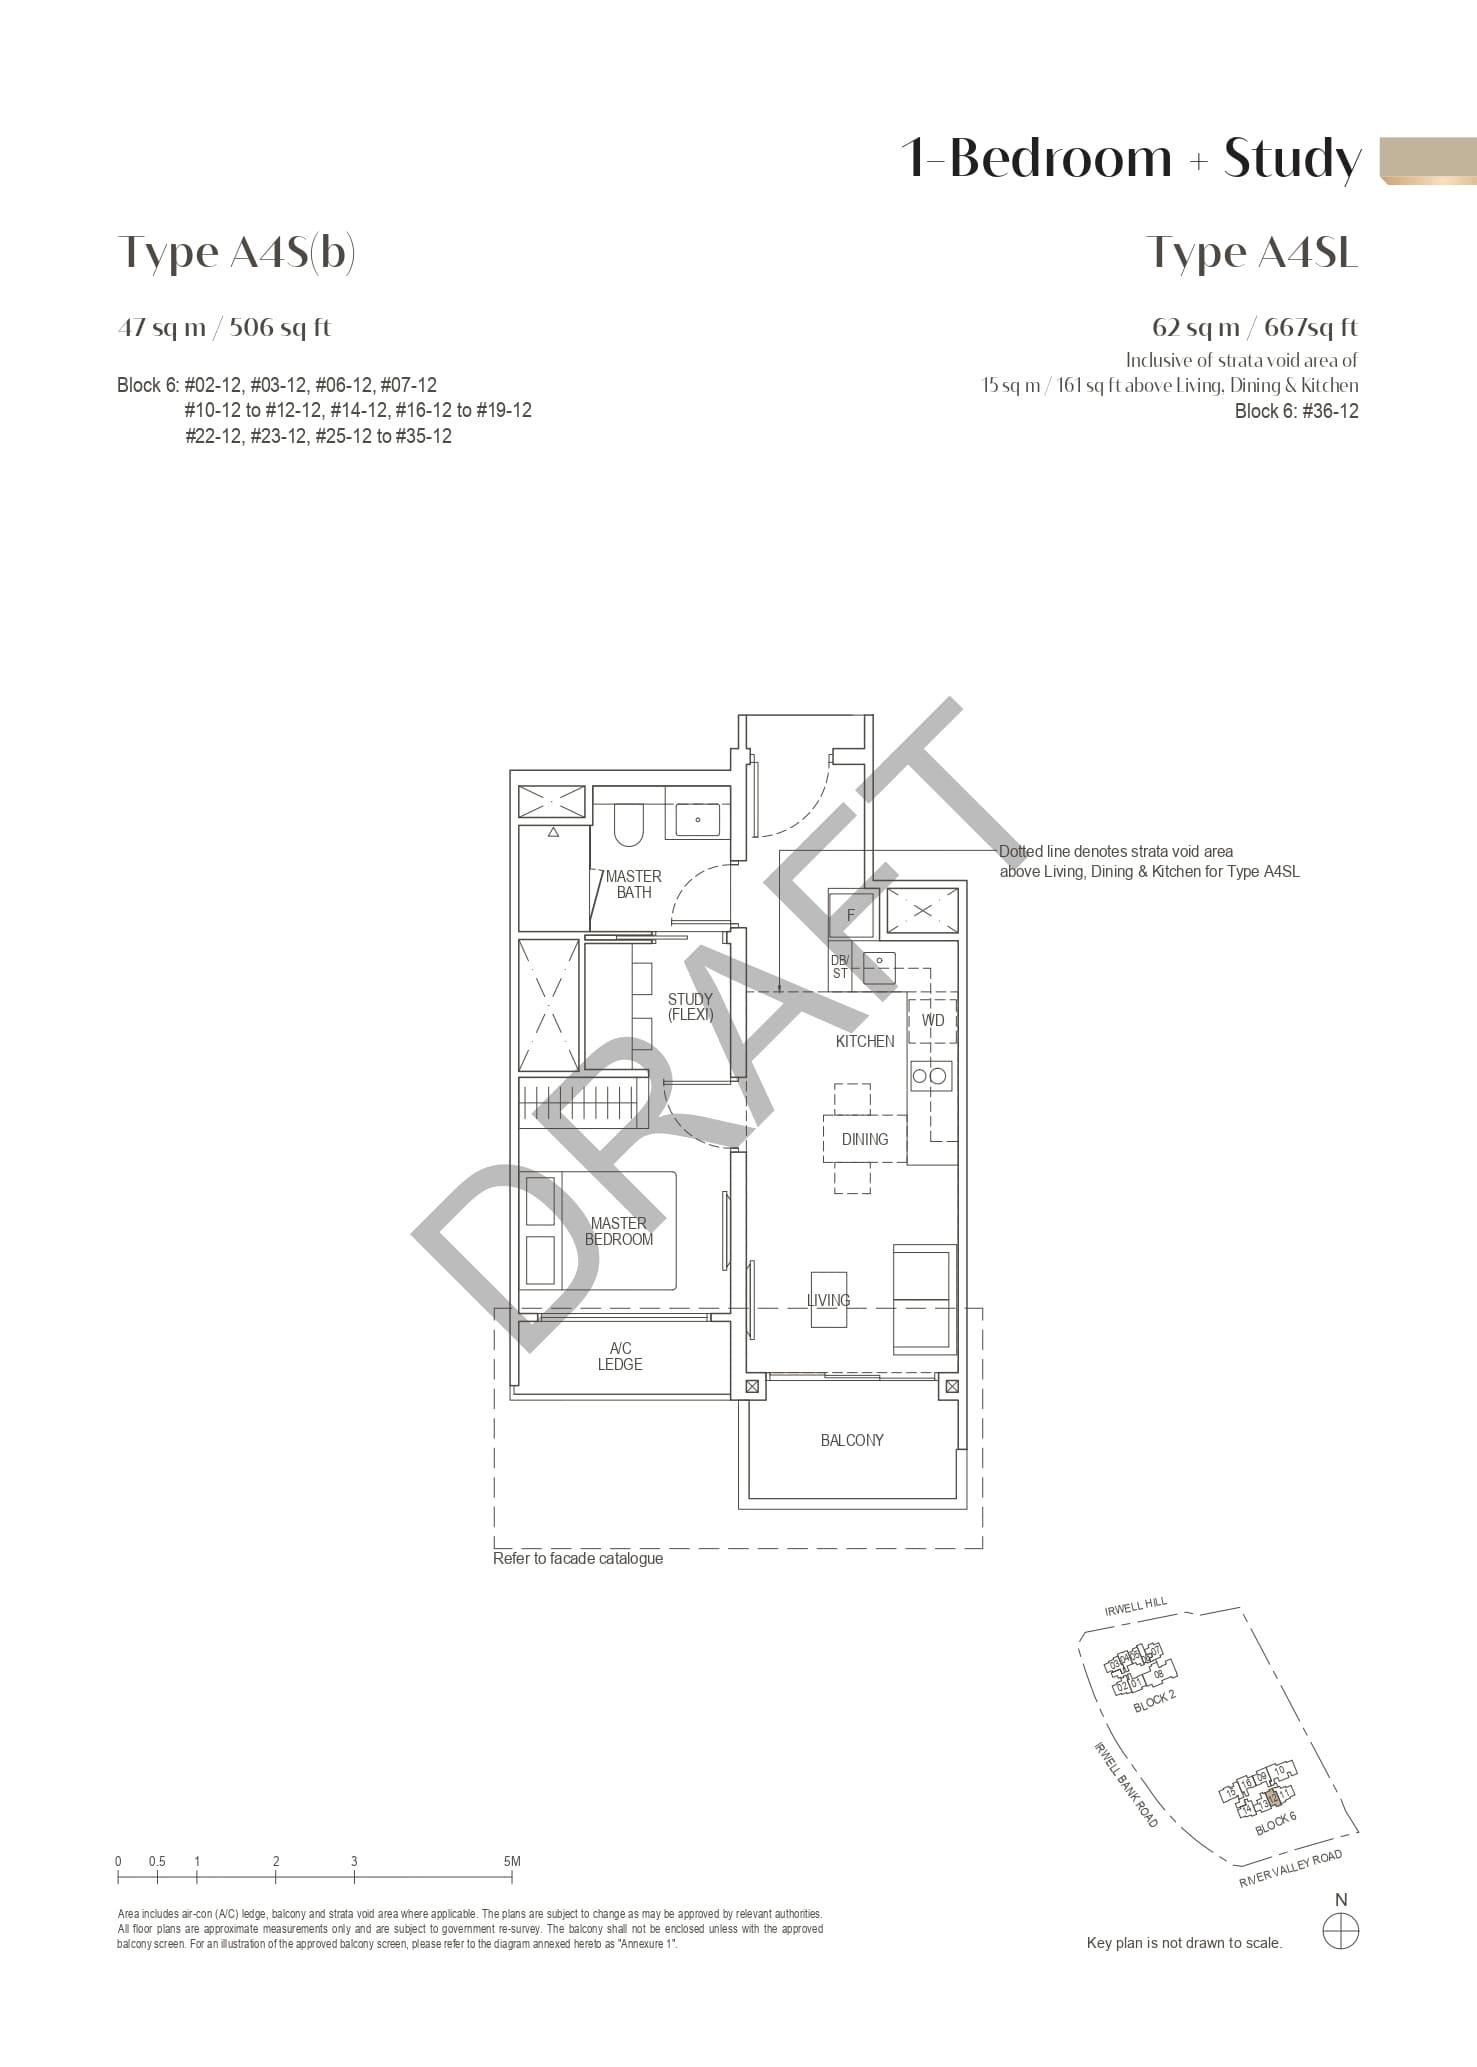 irwell-hill-residences-floor-plan-1-bedroom-study-type-a4sb